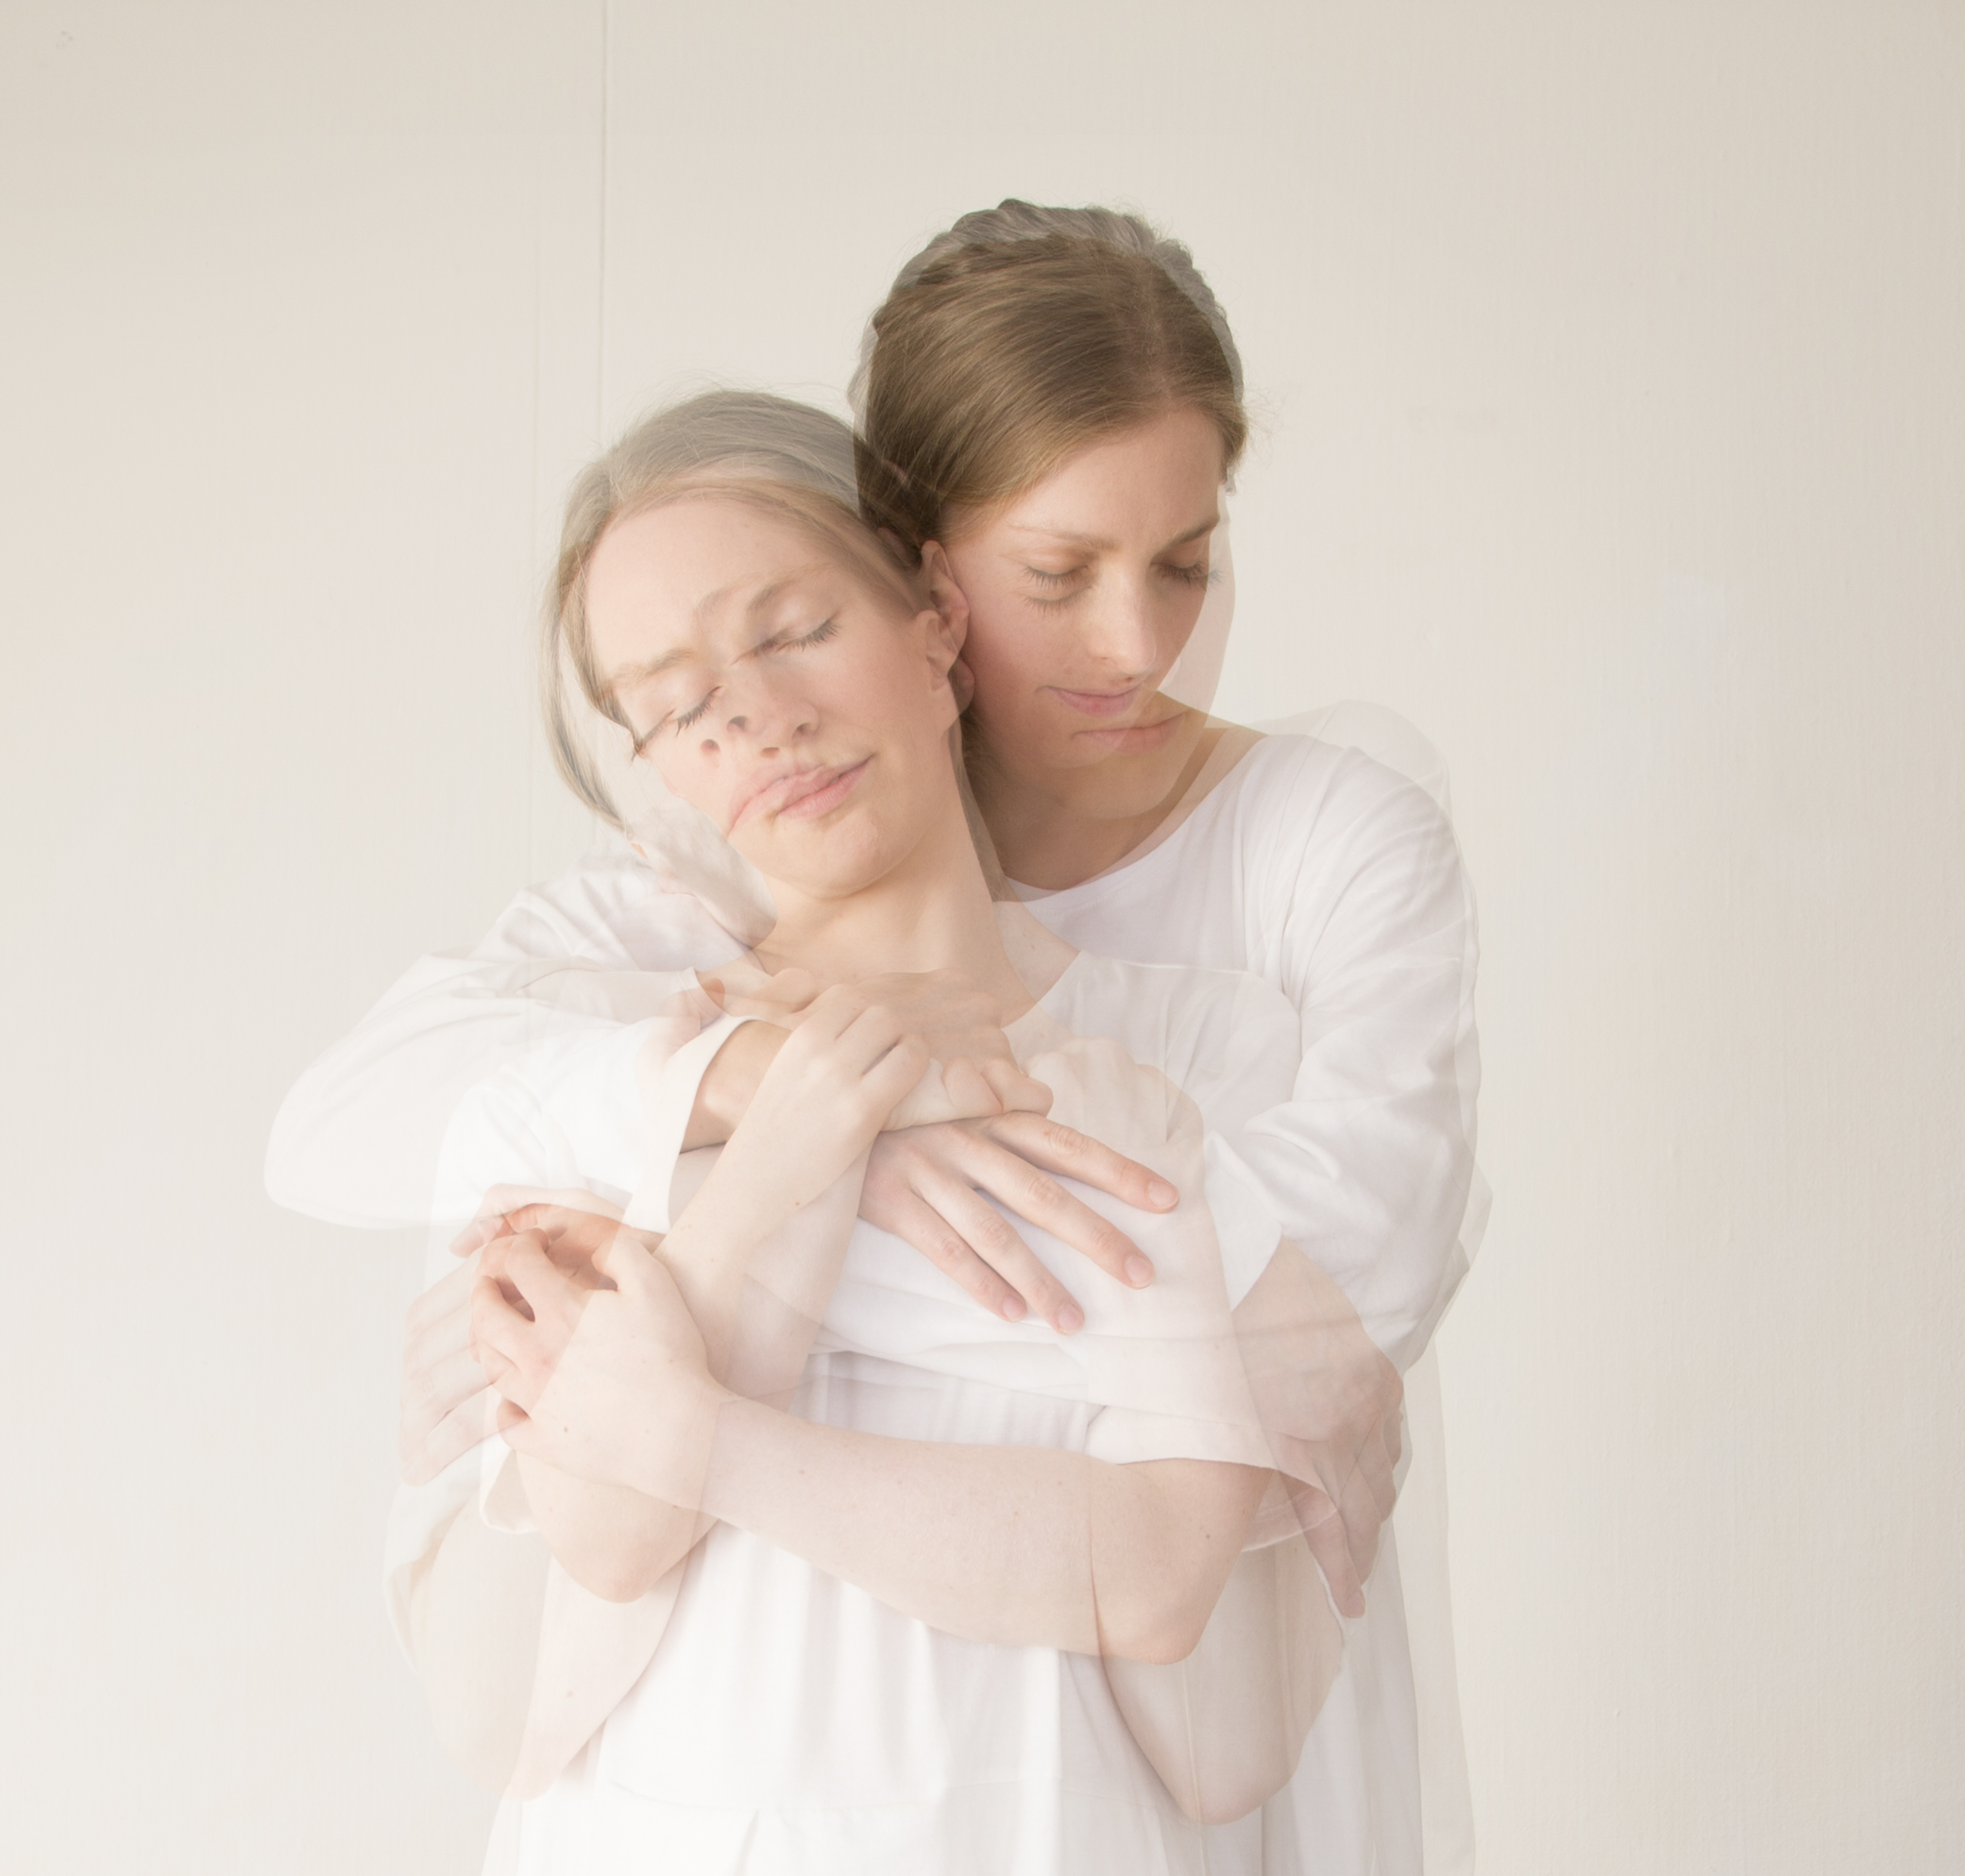 Image by Olivia Webb & Flo Wilson